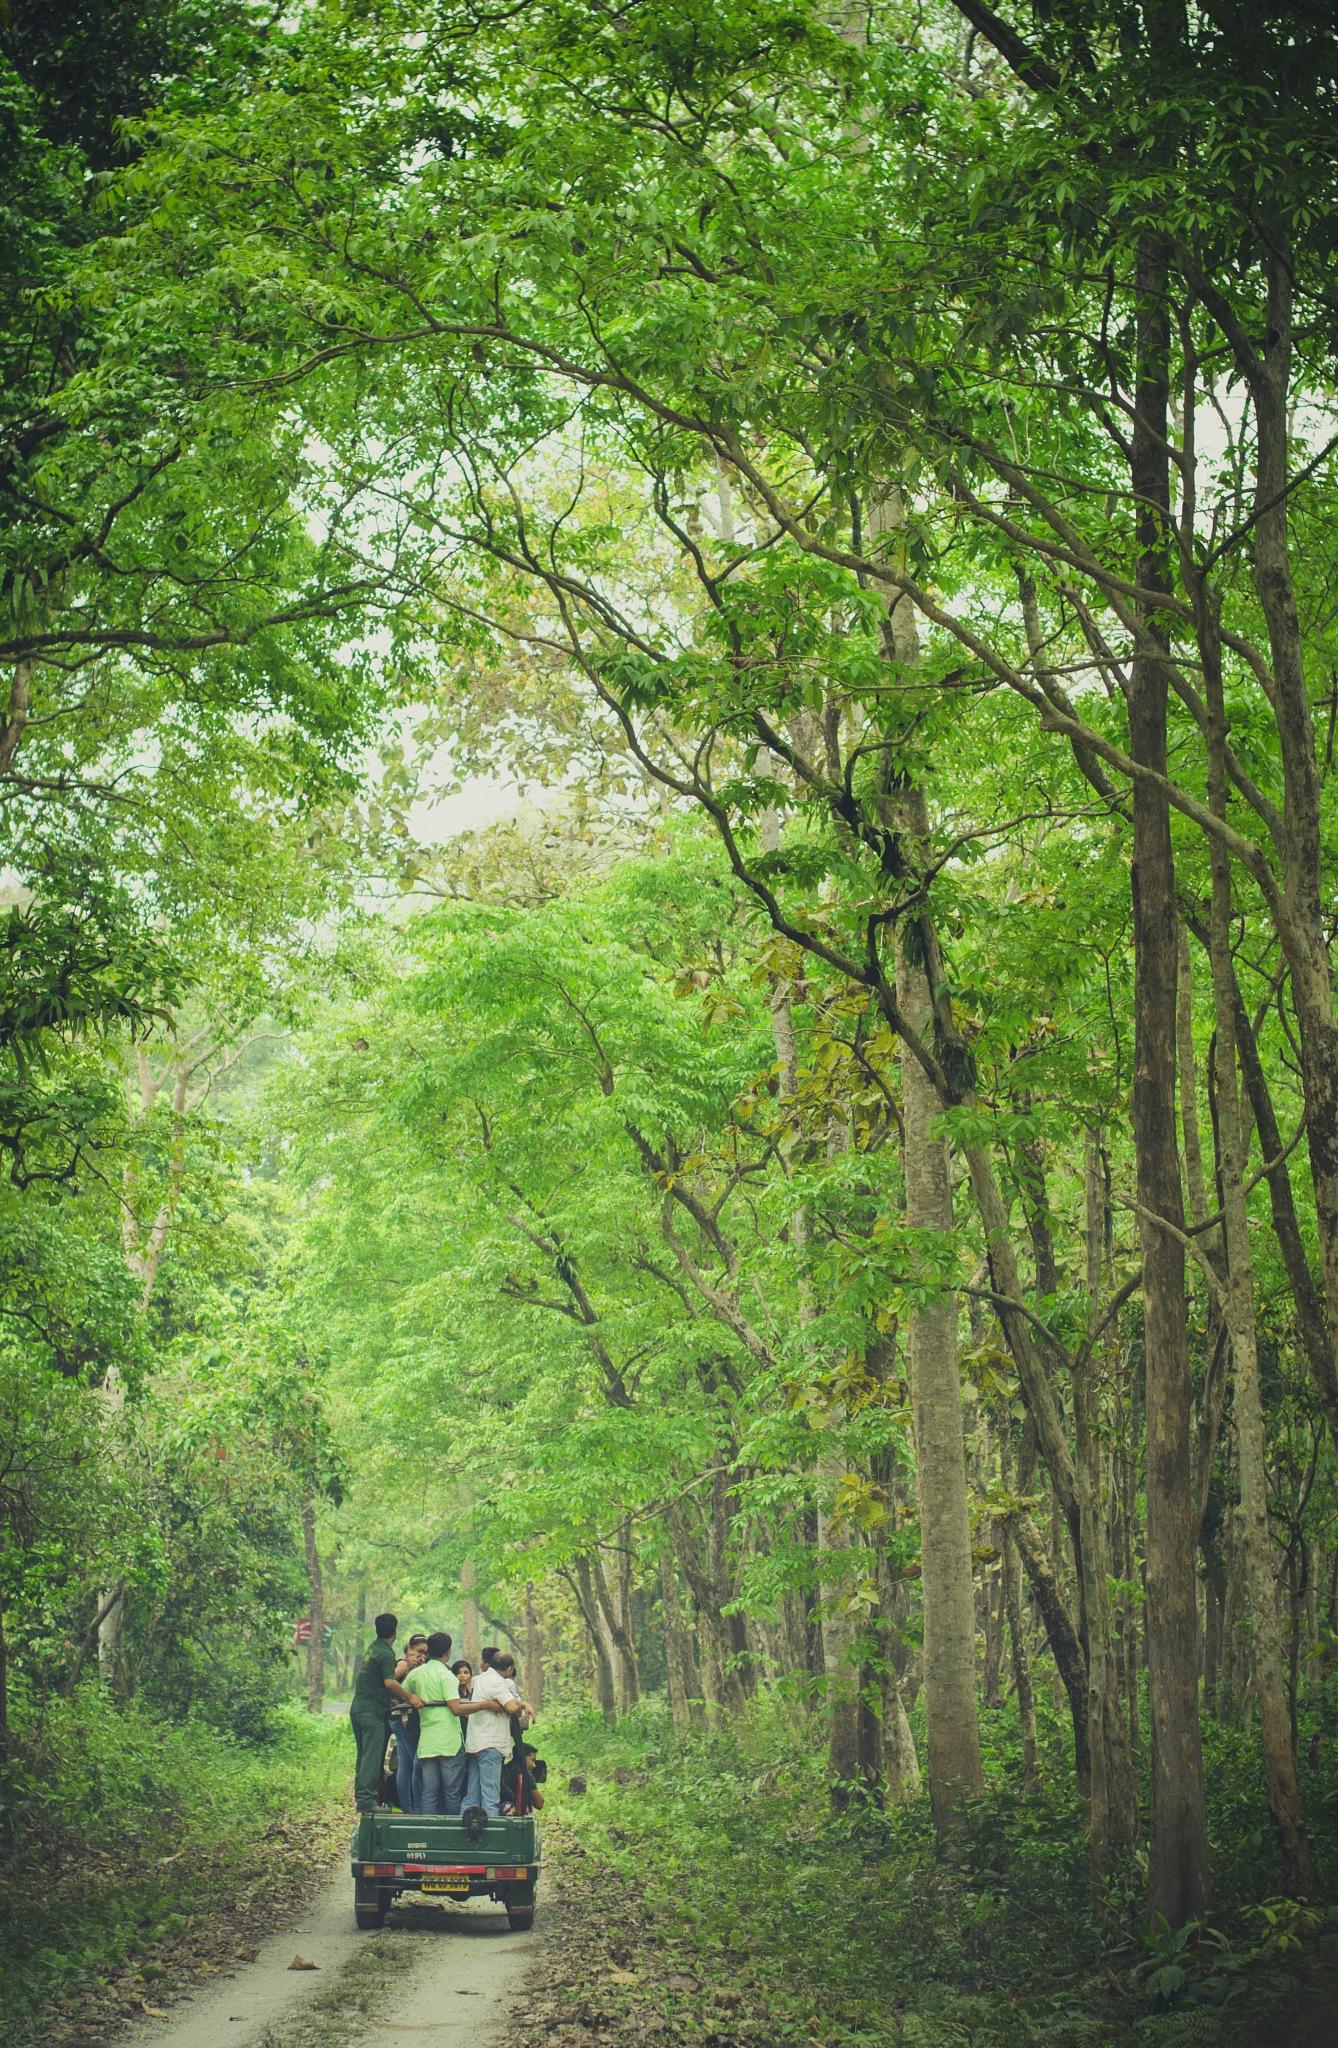 Jungle safari by bappadityadasgupta